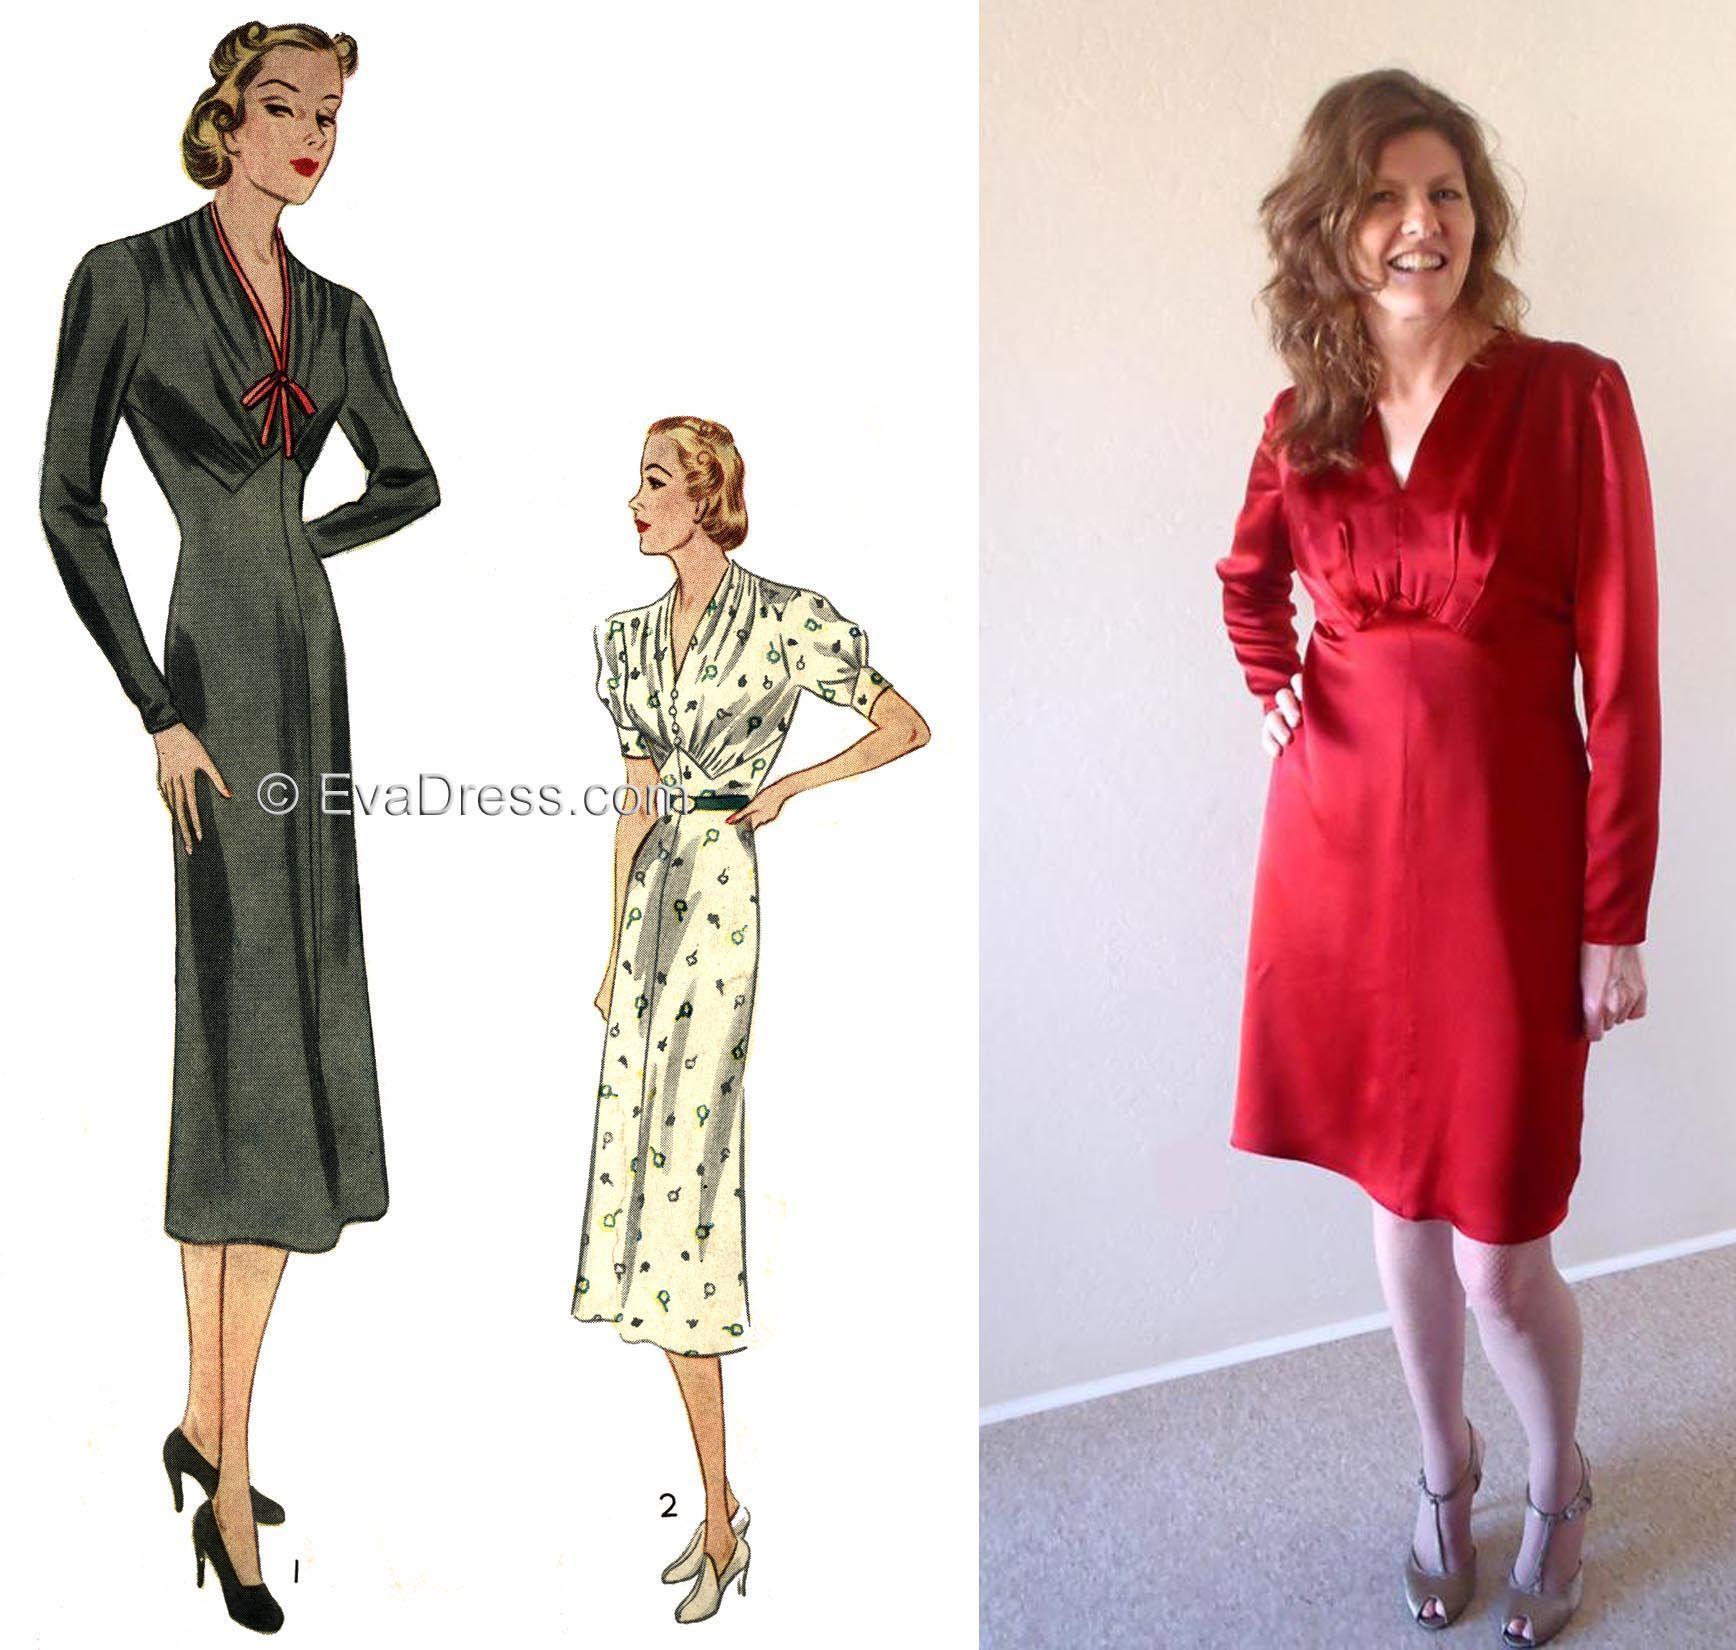 Eva dress 1937 ladies dresses 1930s dress patterns to buy eva dress 1937 ladies dresses jeuxipadfo Choice Image